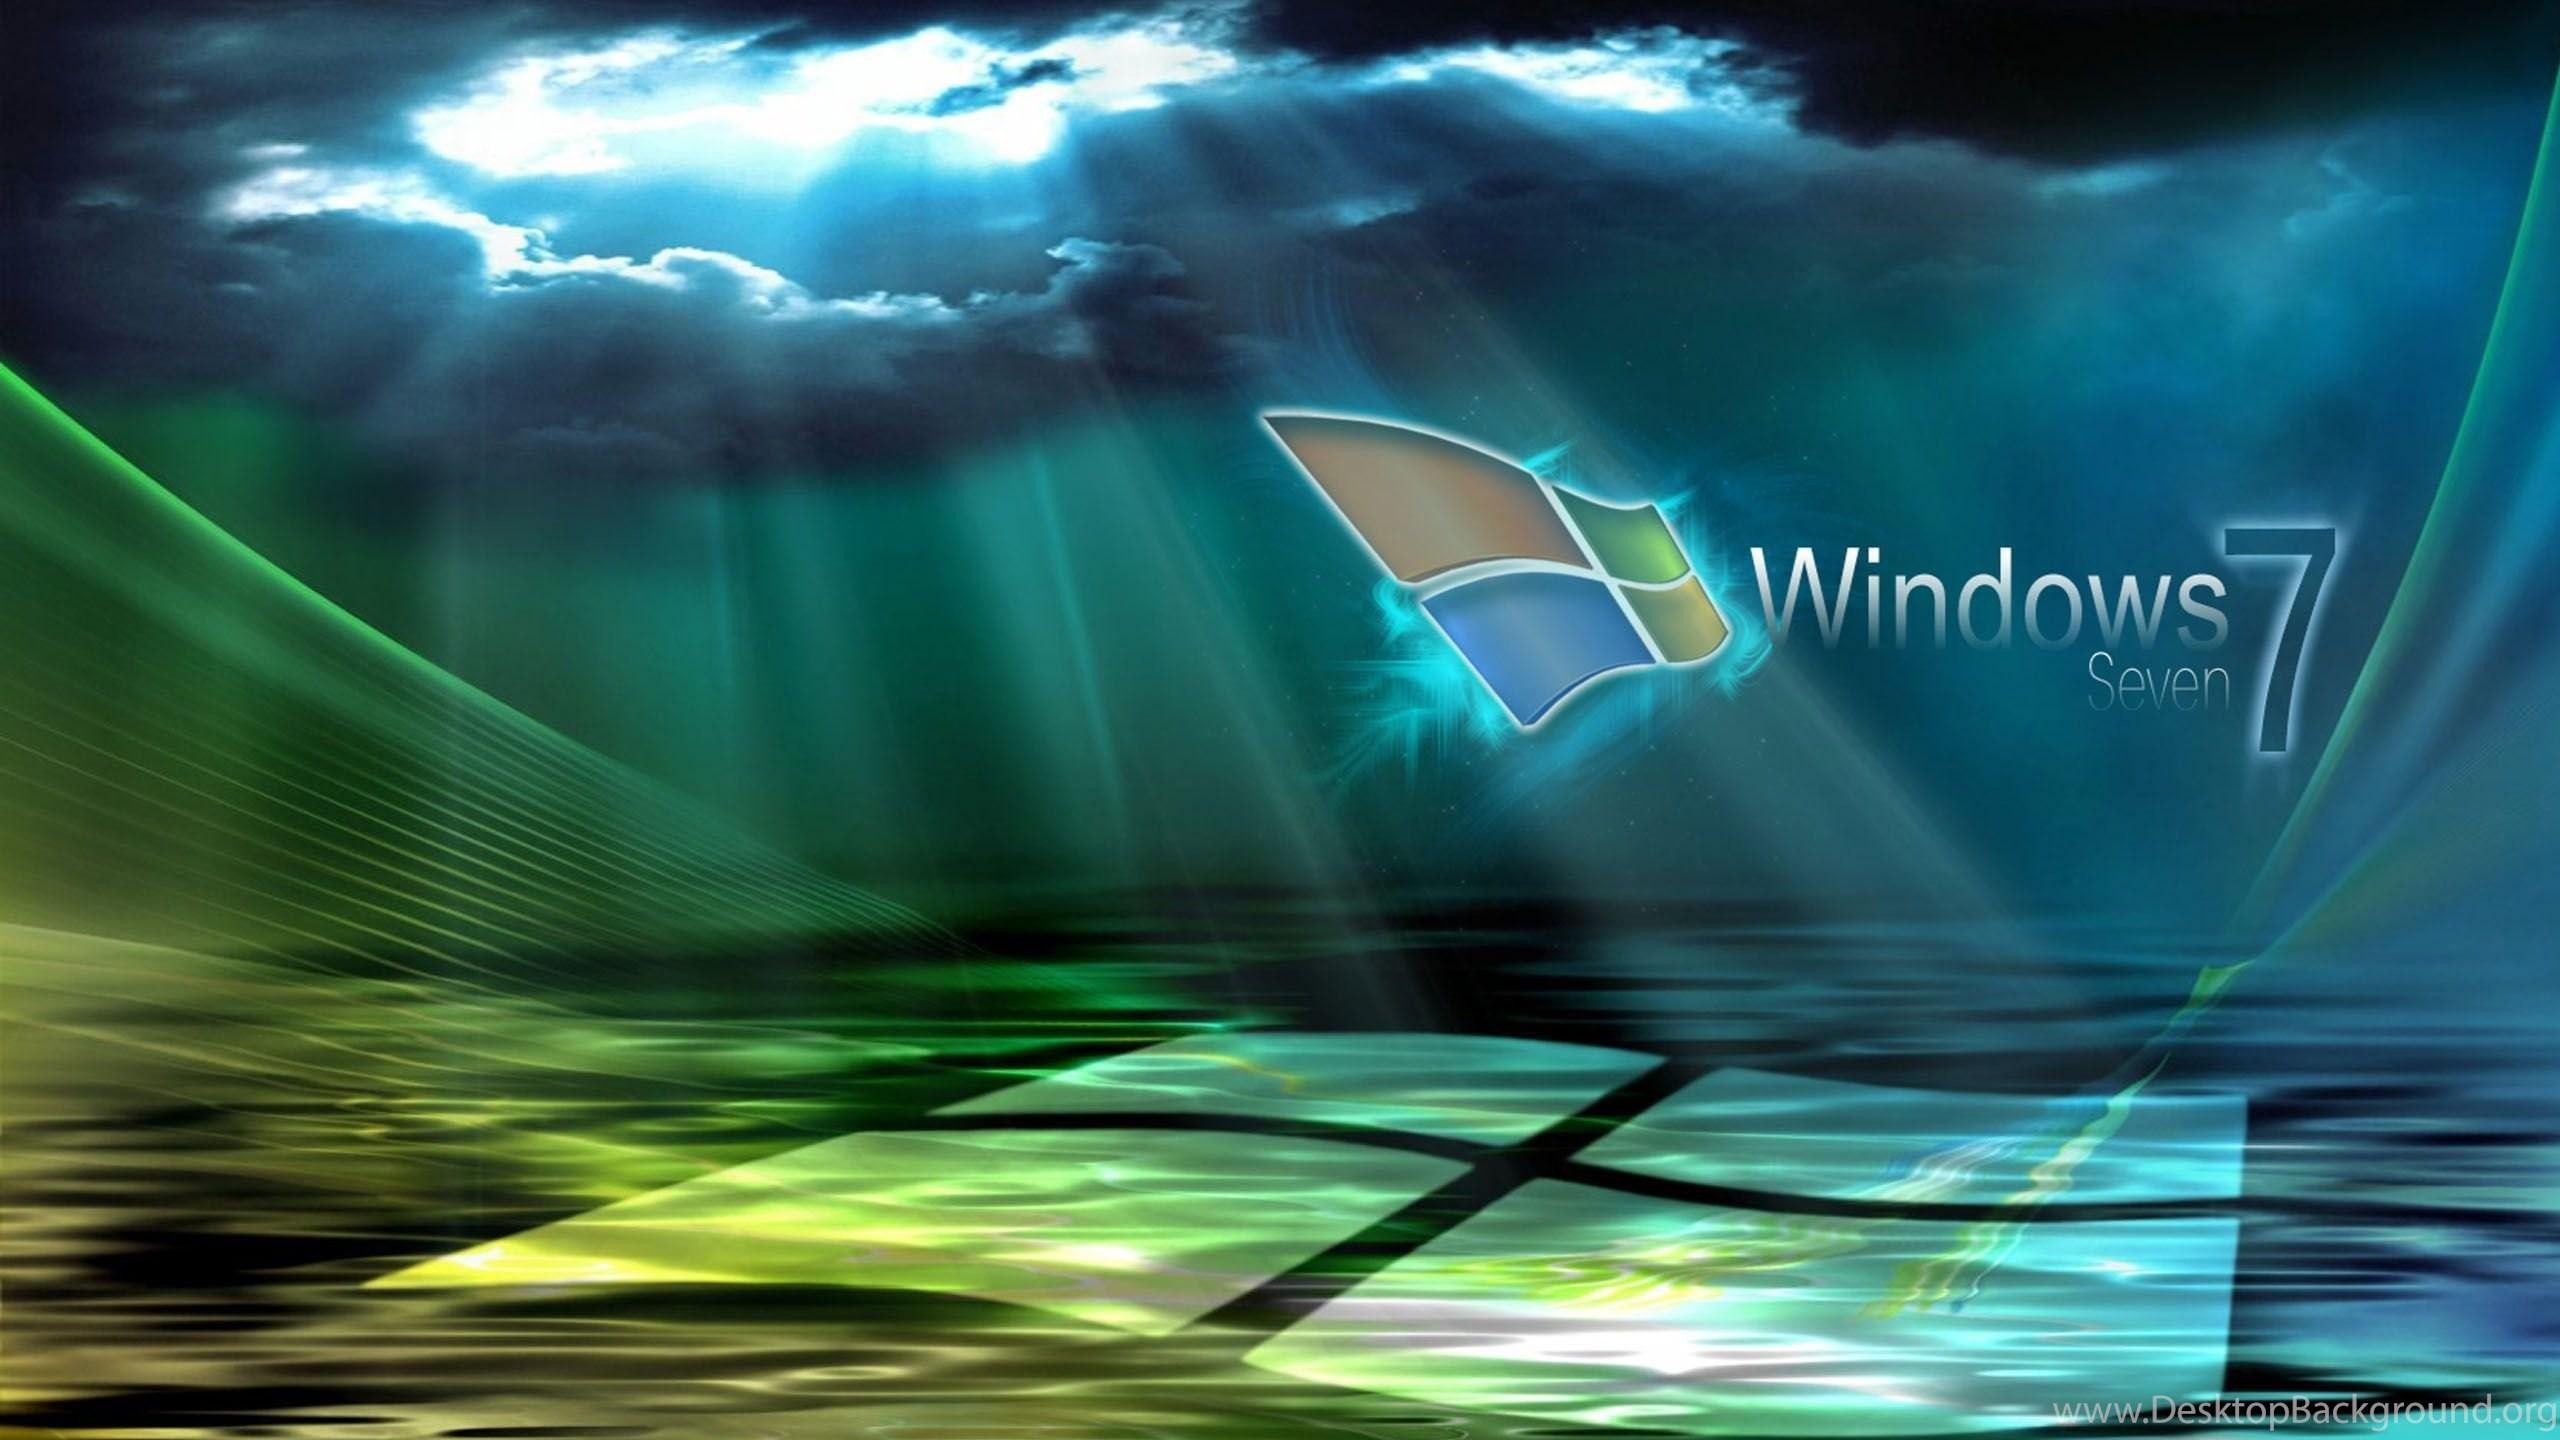 windows 7 wallpapers hd 1646923 desktop background